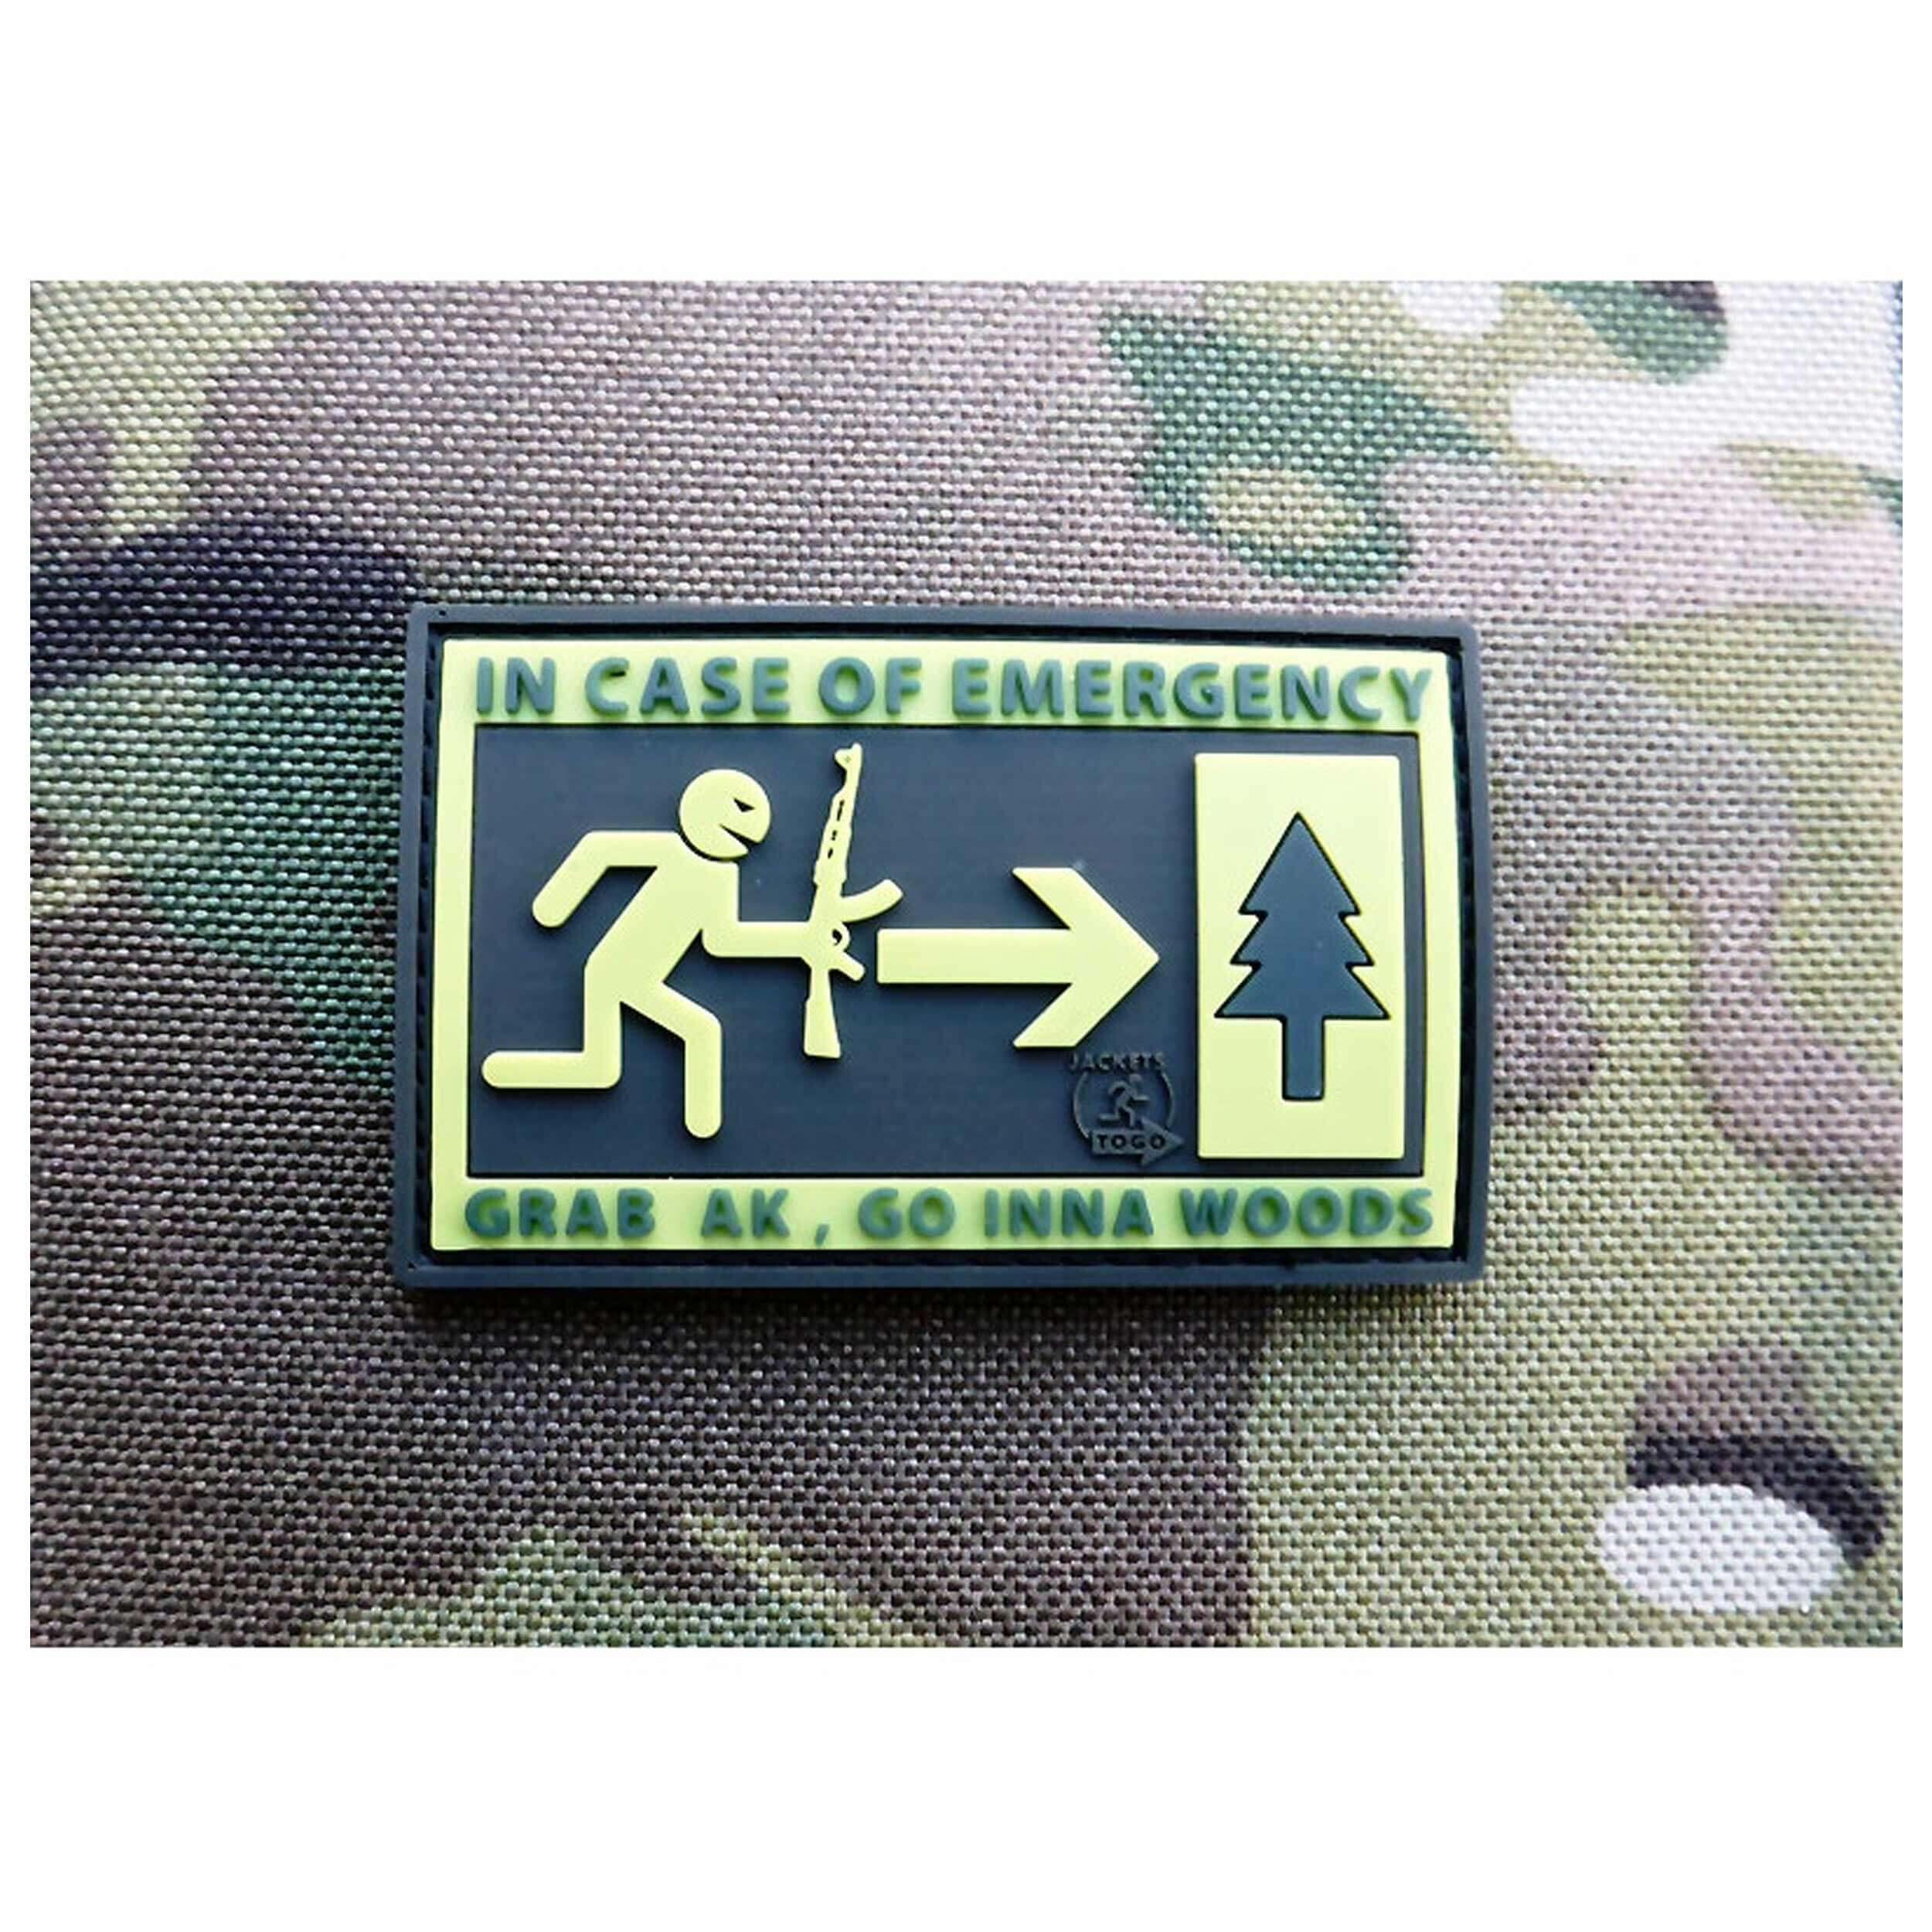 JTG - Emergency Patch, fullcolor / 3D Rubber patch